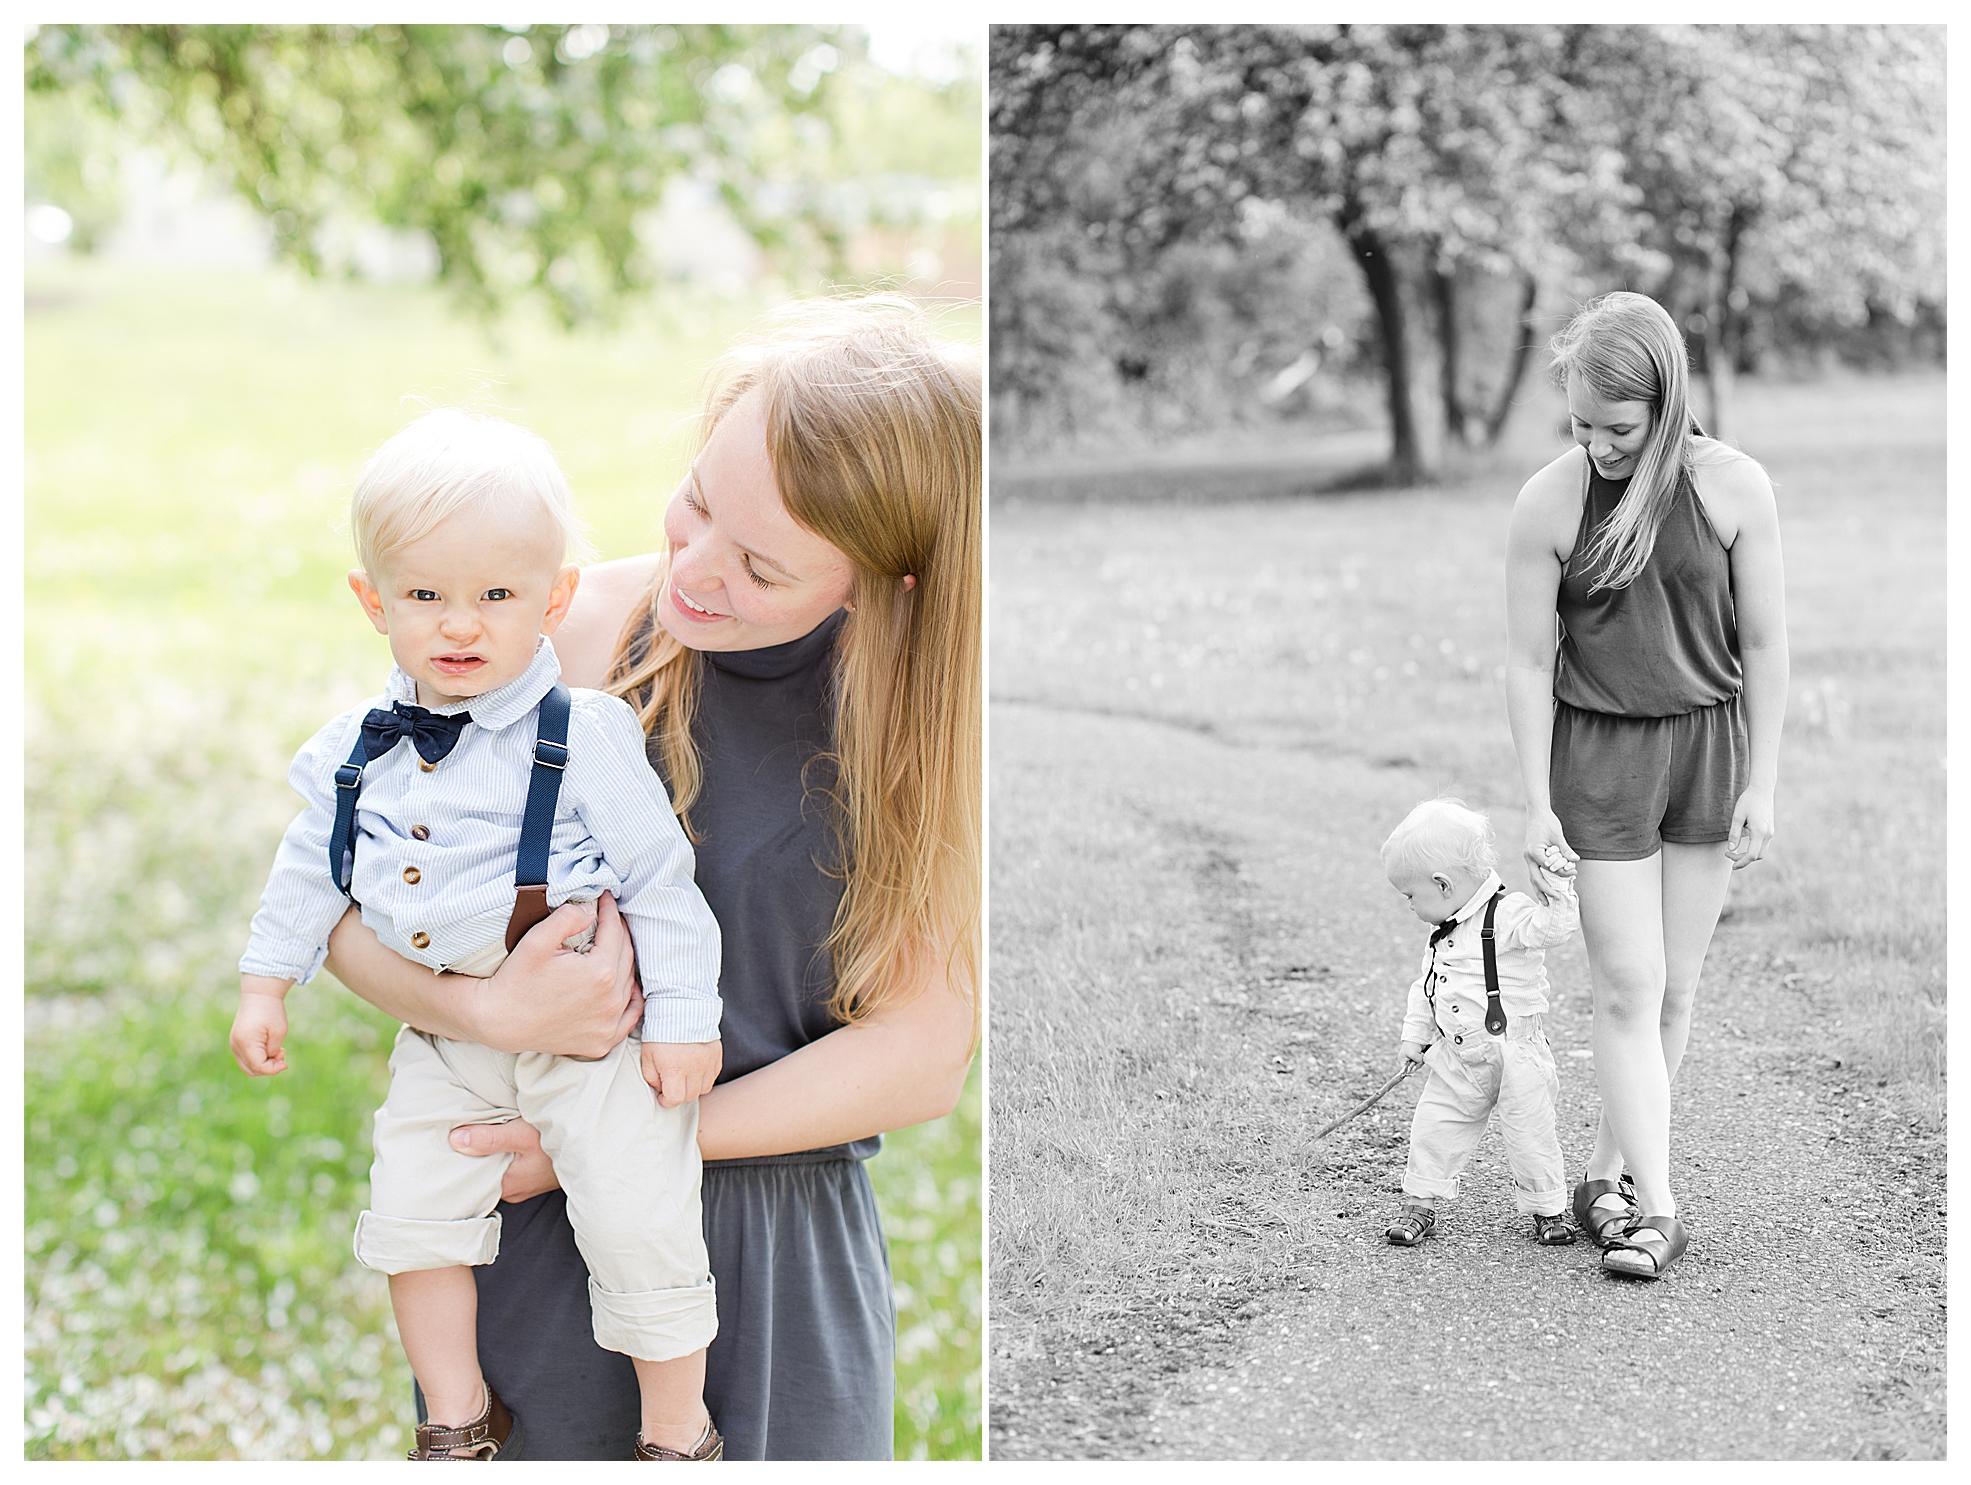 Houghton County Family Photographer_0003.jpg